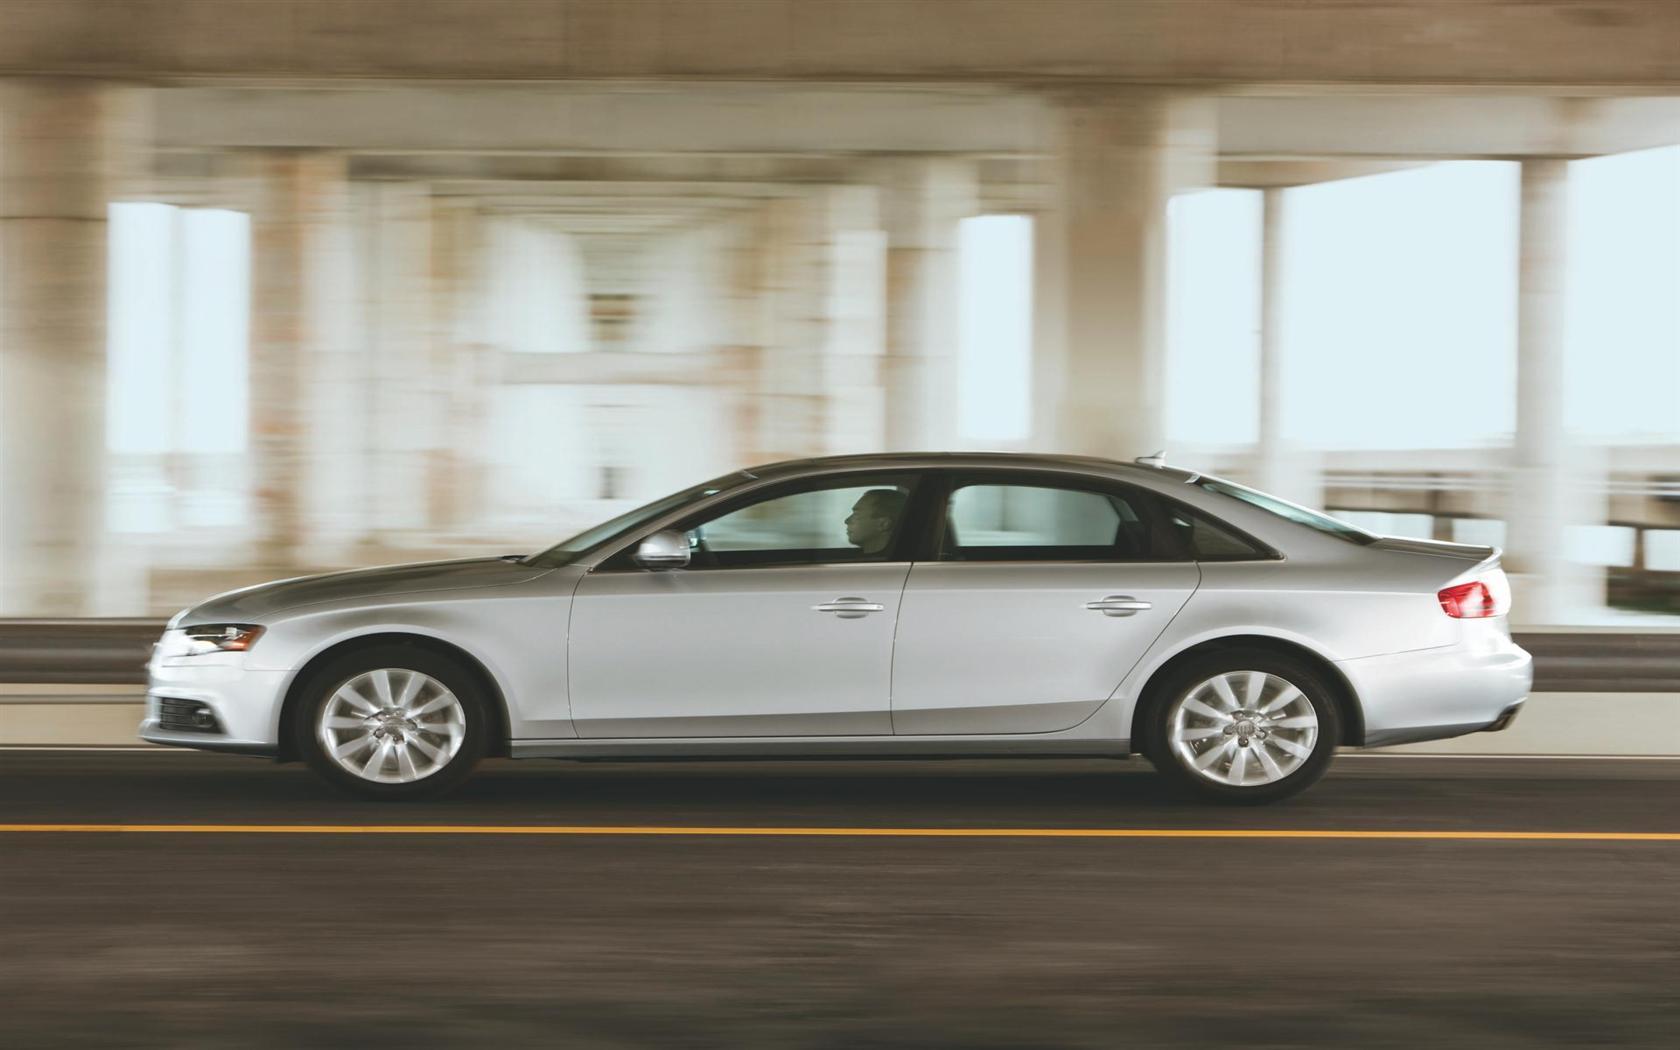 2012 Audi A4 Image